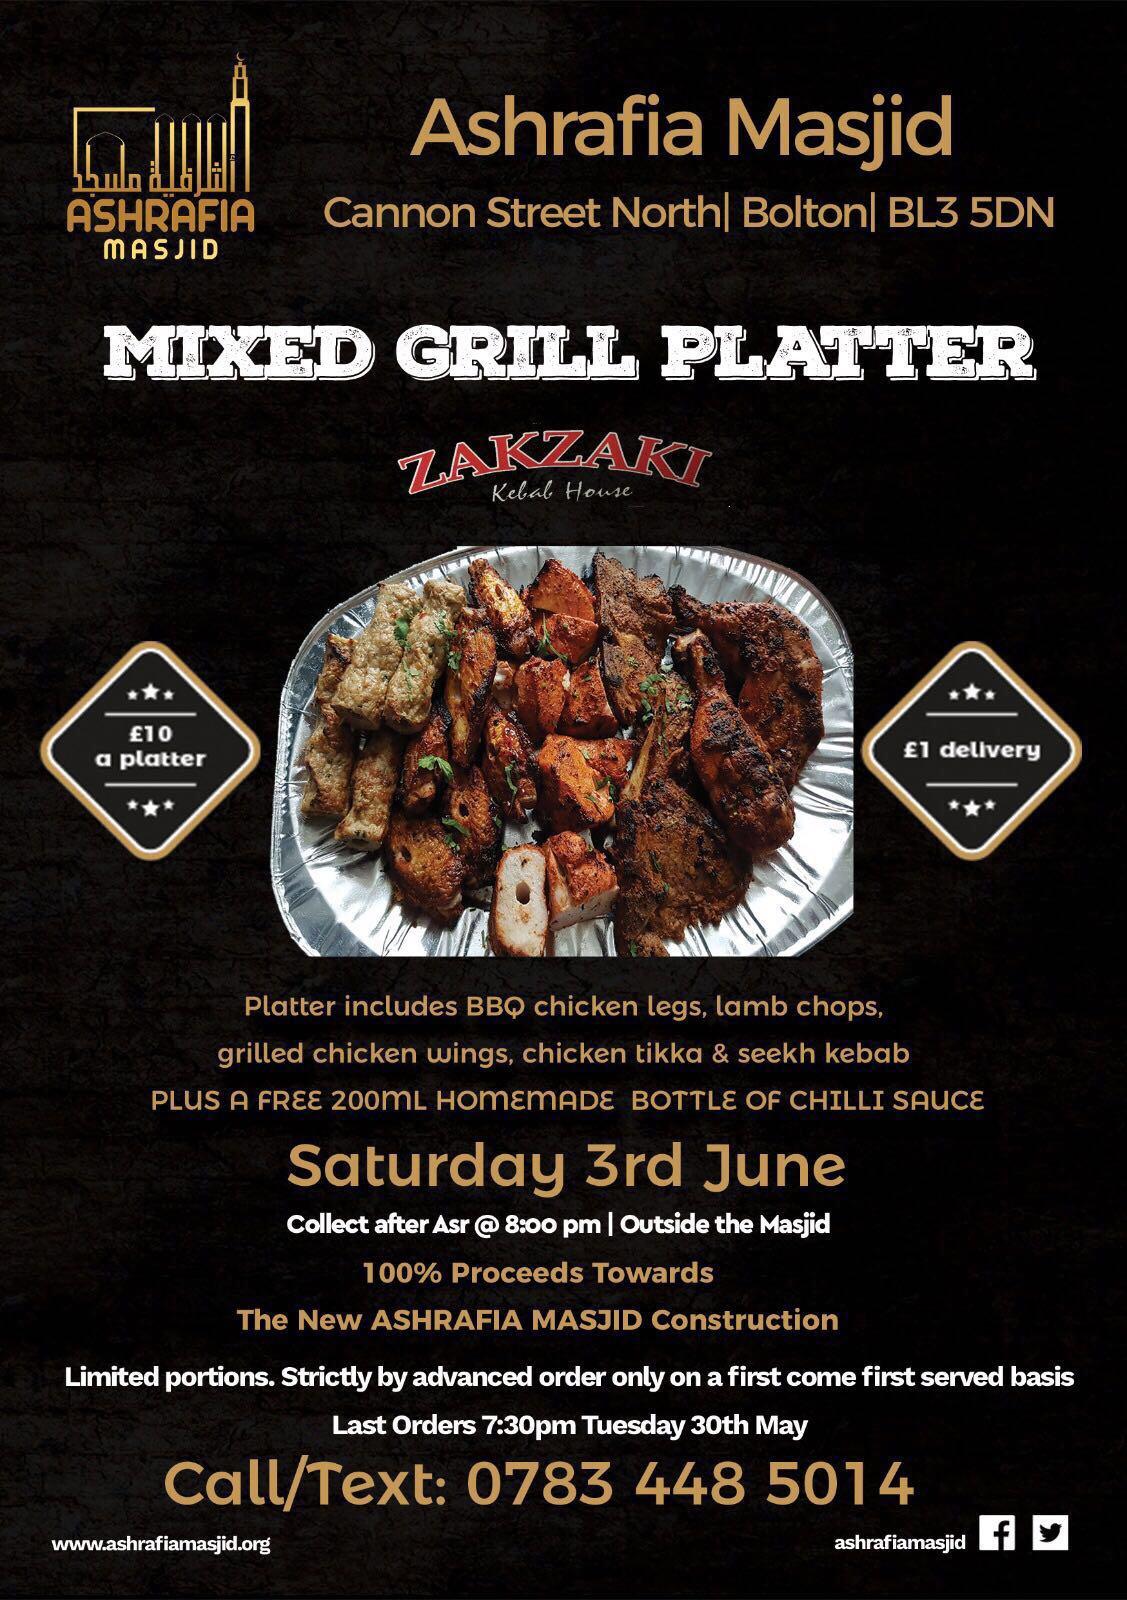 Mixed Grill Platter Fundraiser Ashrafia Masjid Ramadhan 2017